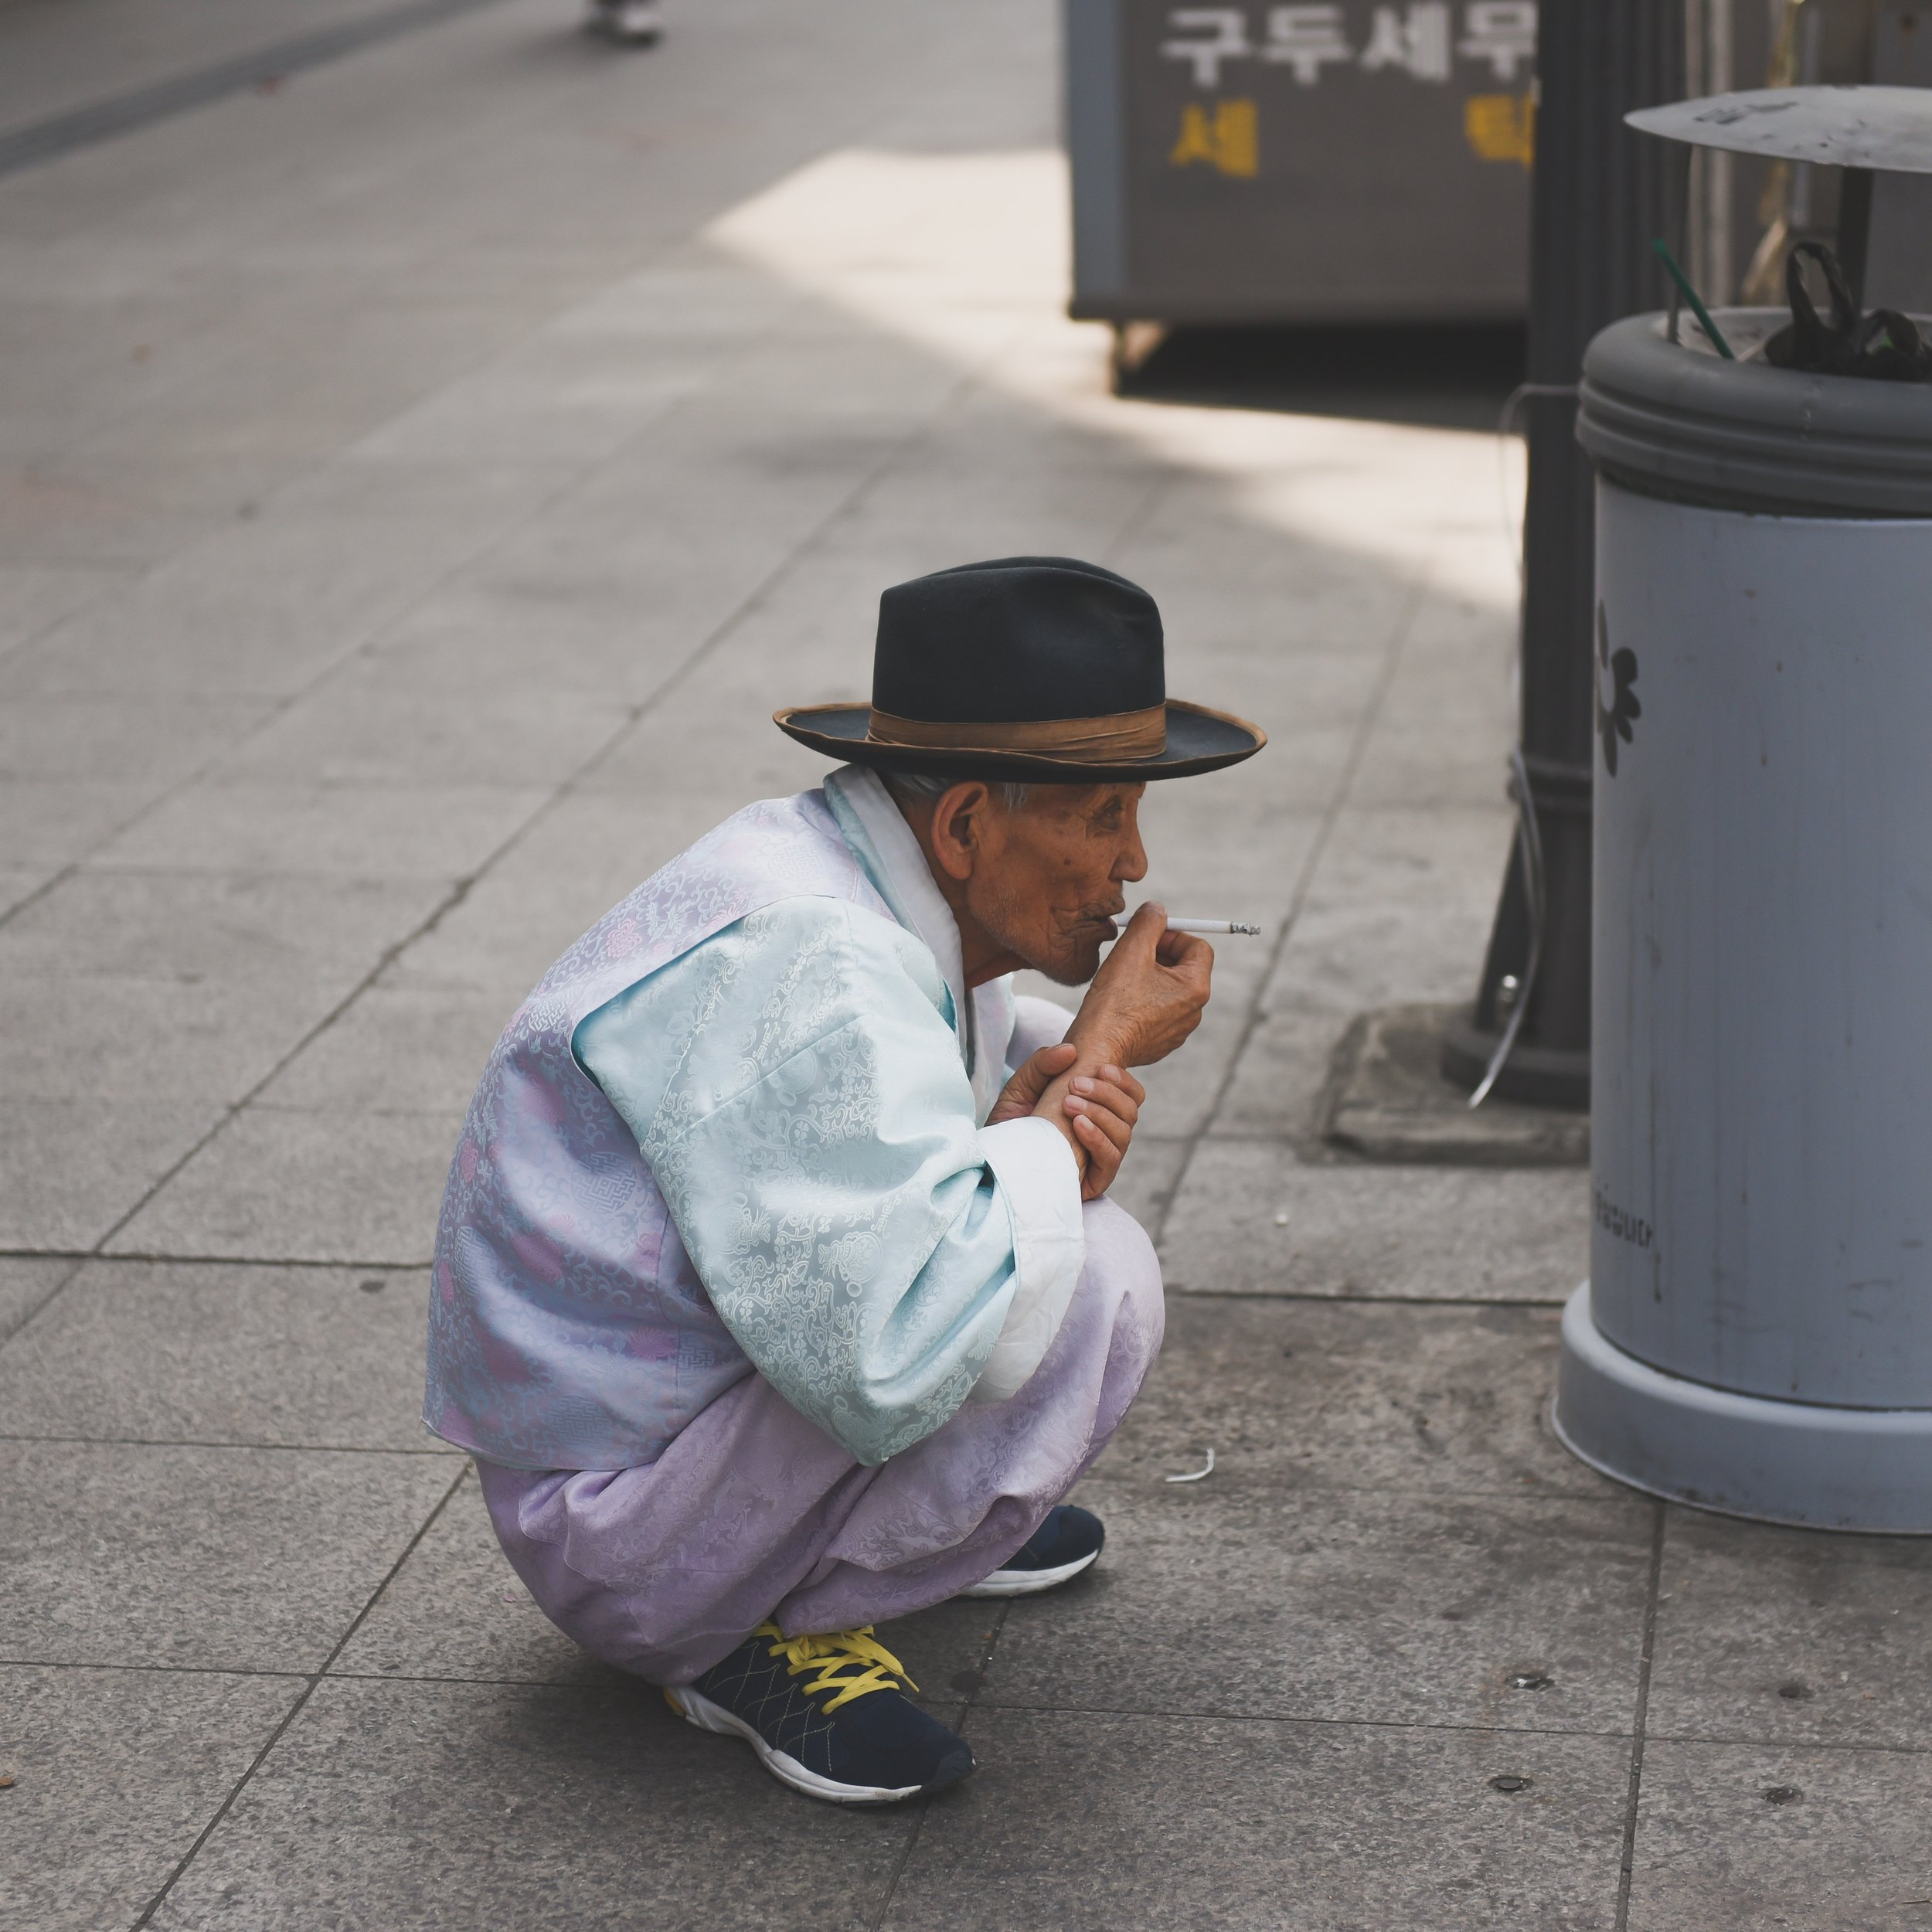 Guy crouching and smoking cig.jpg